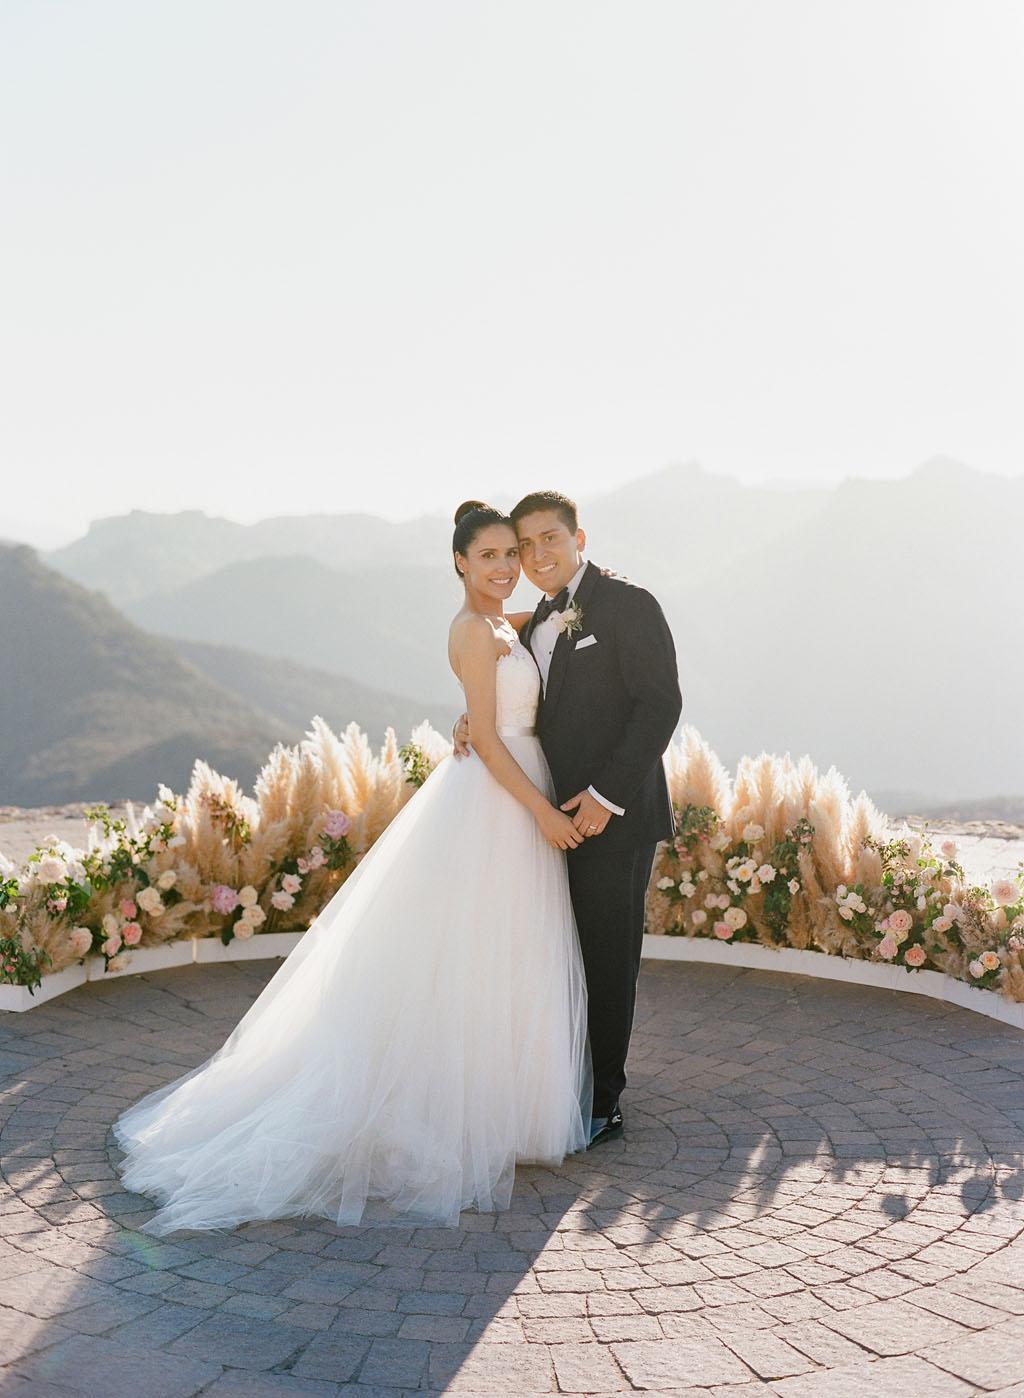 aislinn eric wedding malibu bride groom